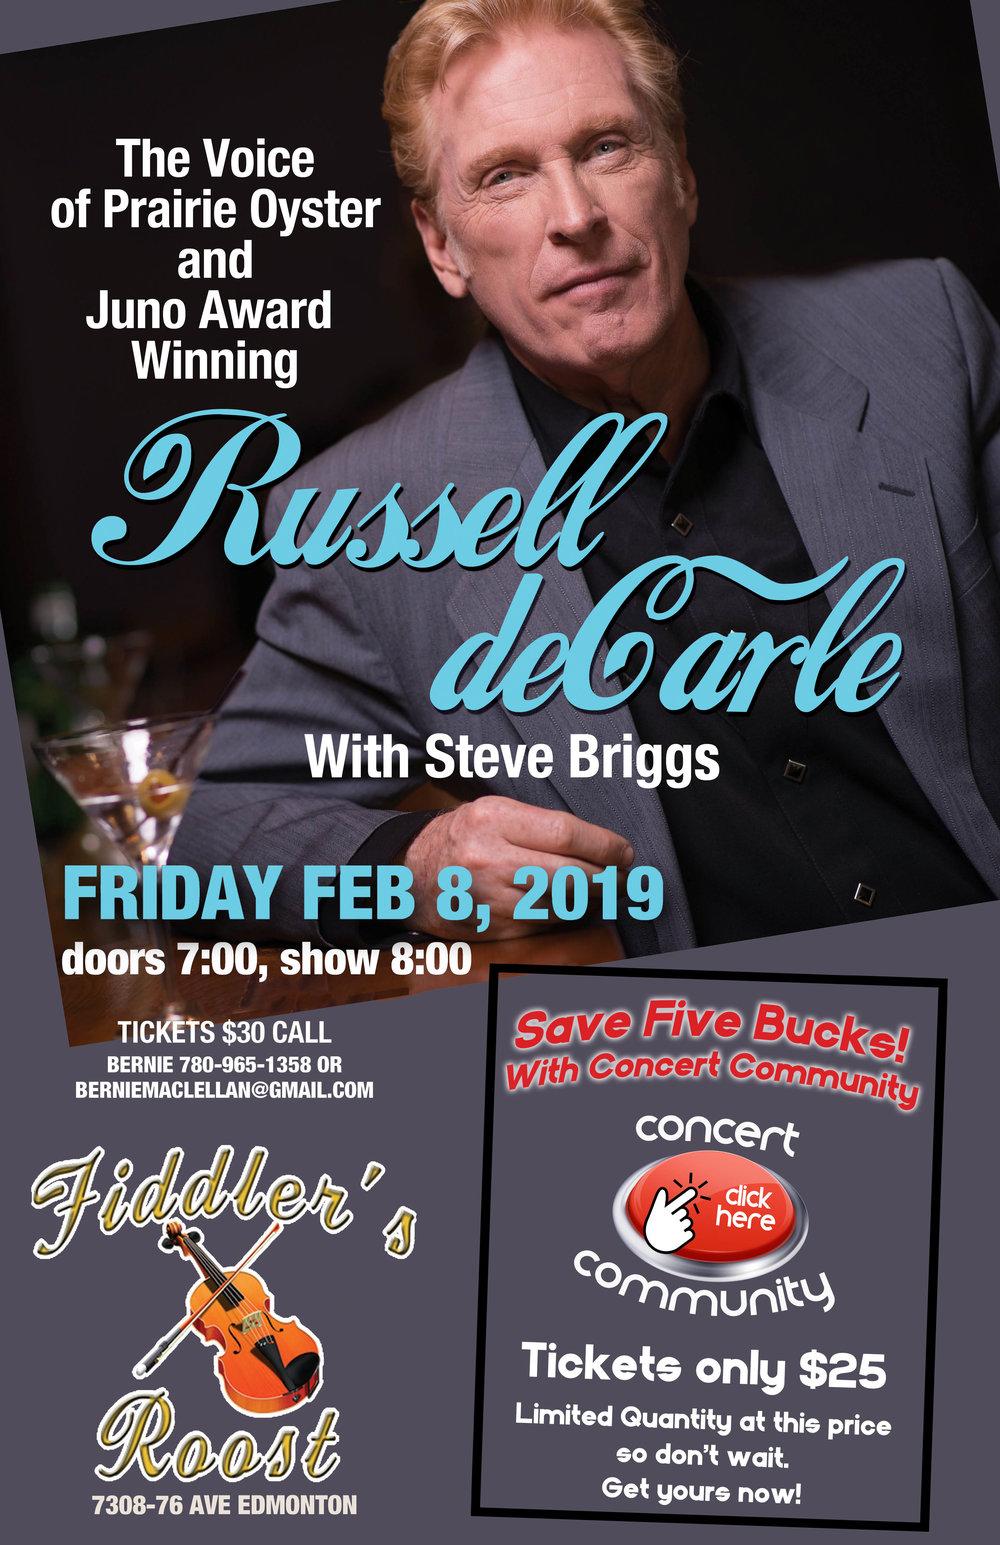 Blueberry Bluegrass Festival - Concert Community - Russell deCarle